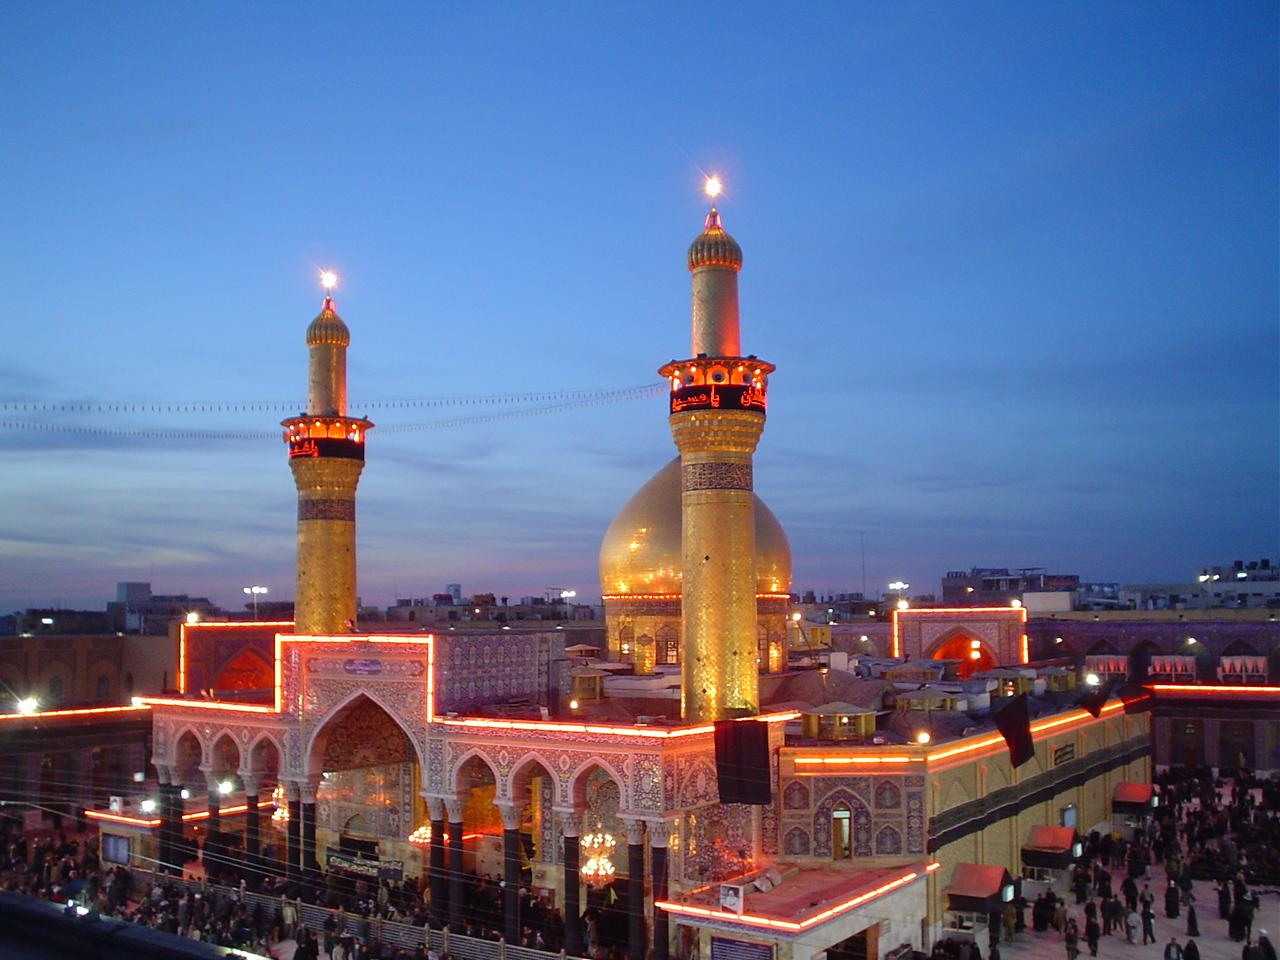 Karbala Alamto.Com 003 عکس های بسیار زیبا از حرم امام حسین عکس